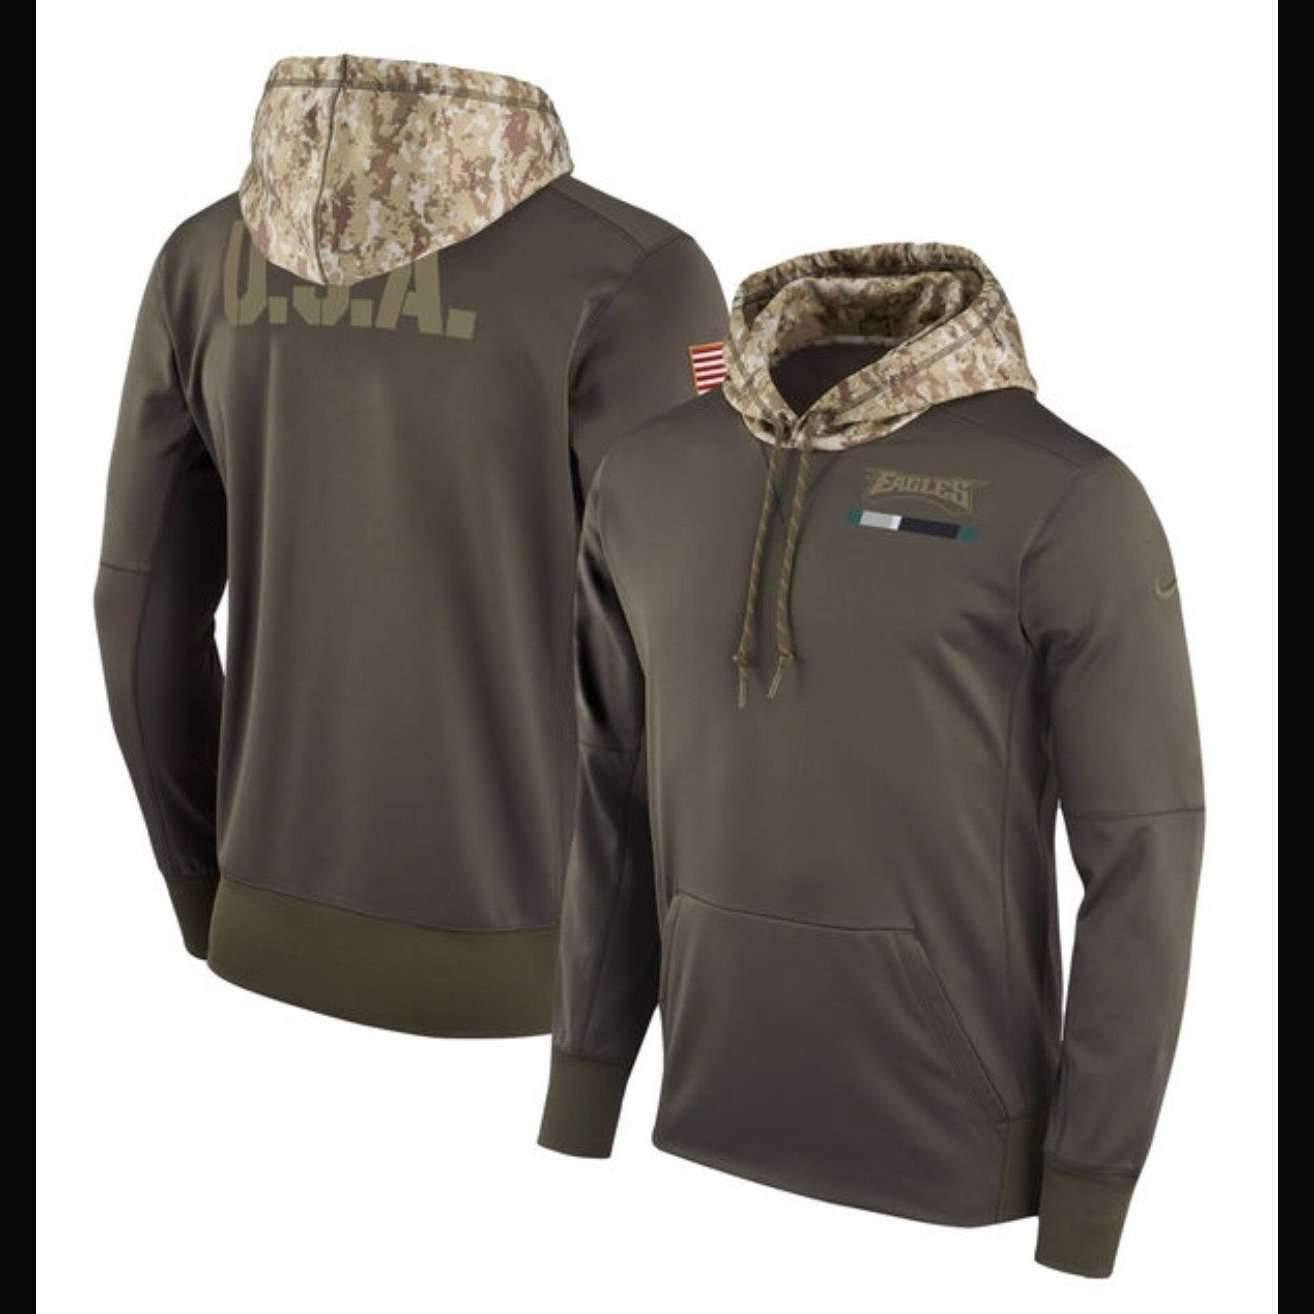 eagles military sweatshirt